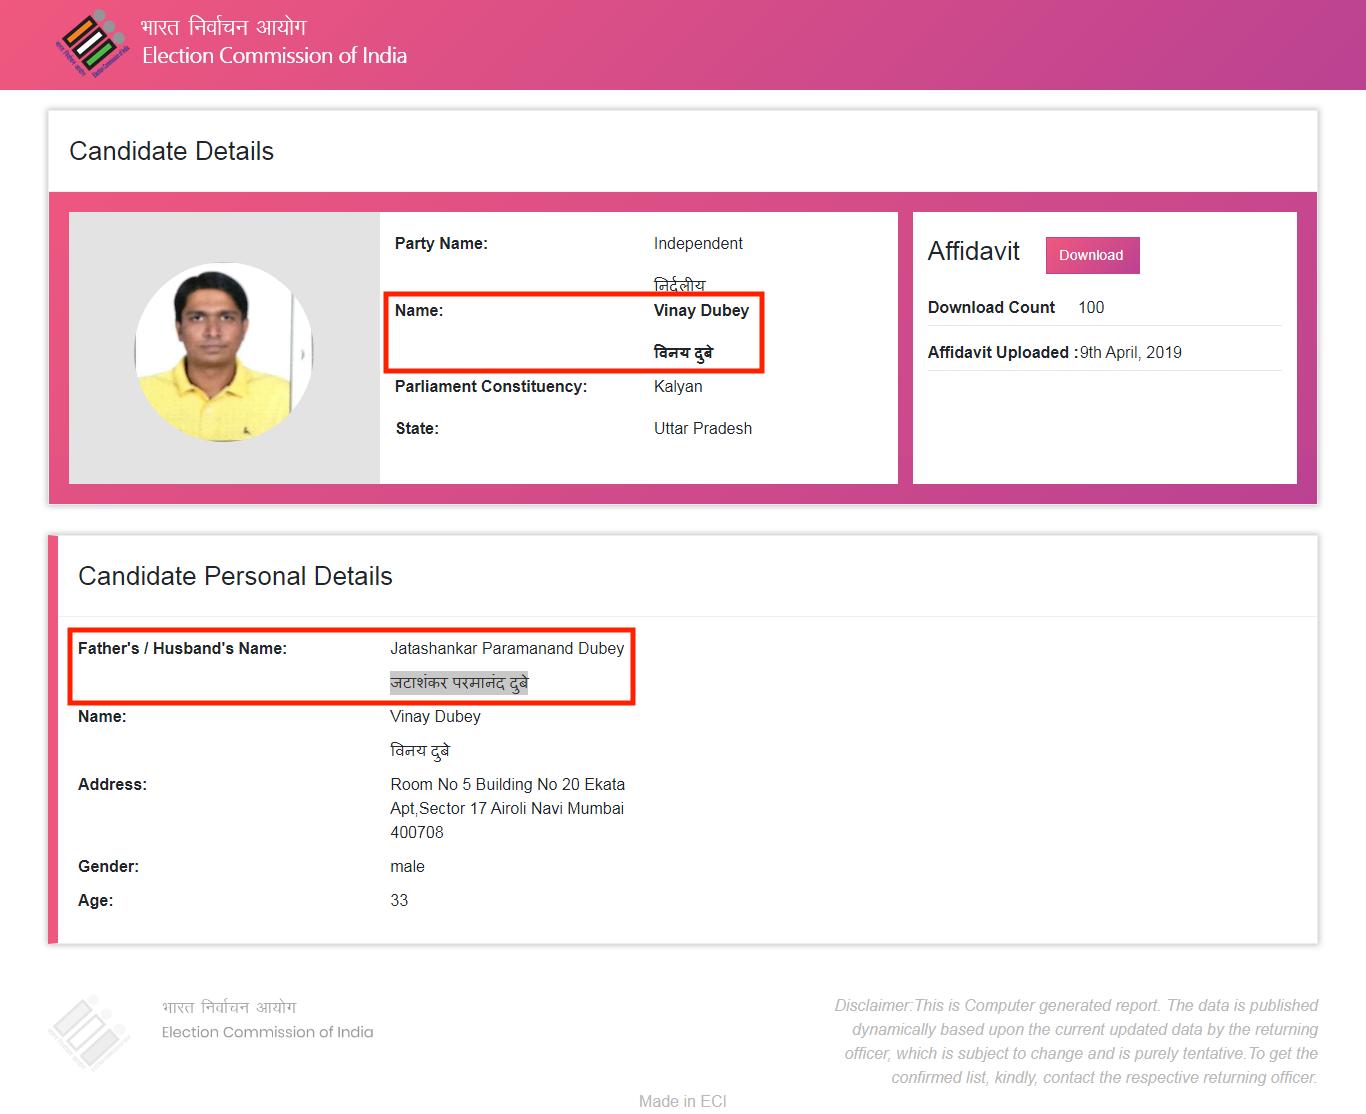 C:\Users\Lenovo\Desktop\FC\Vinay Dubey Chandrashekhar Azad3.jpg